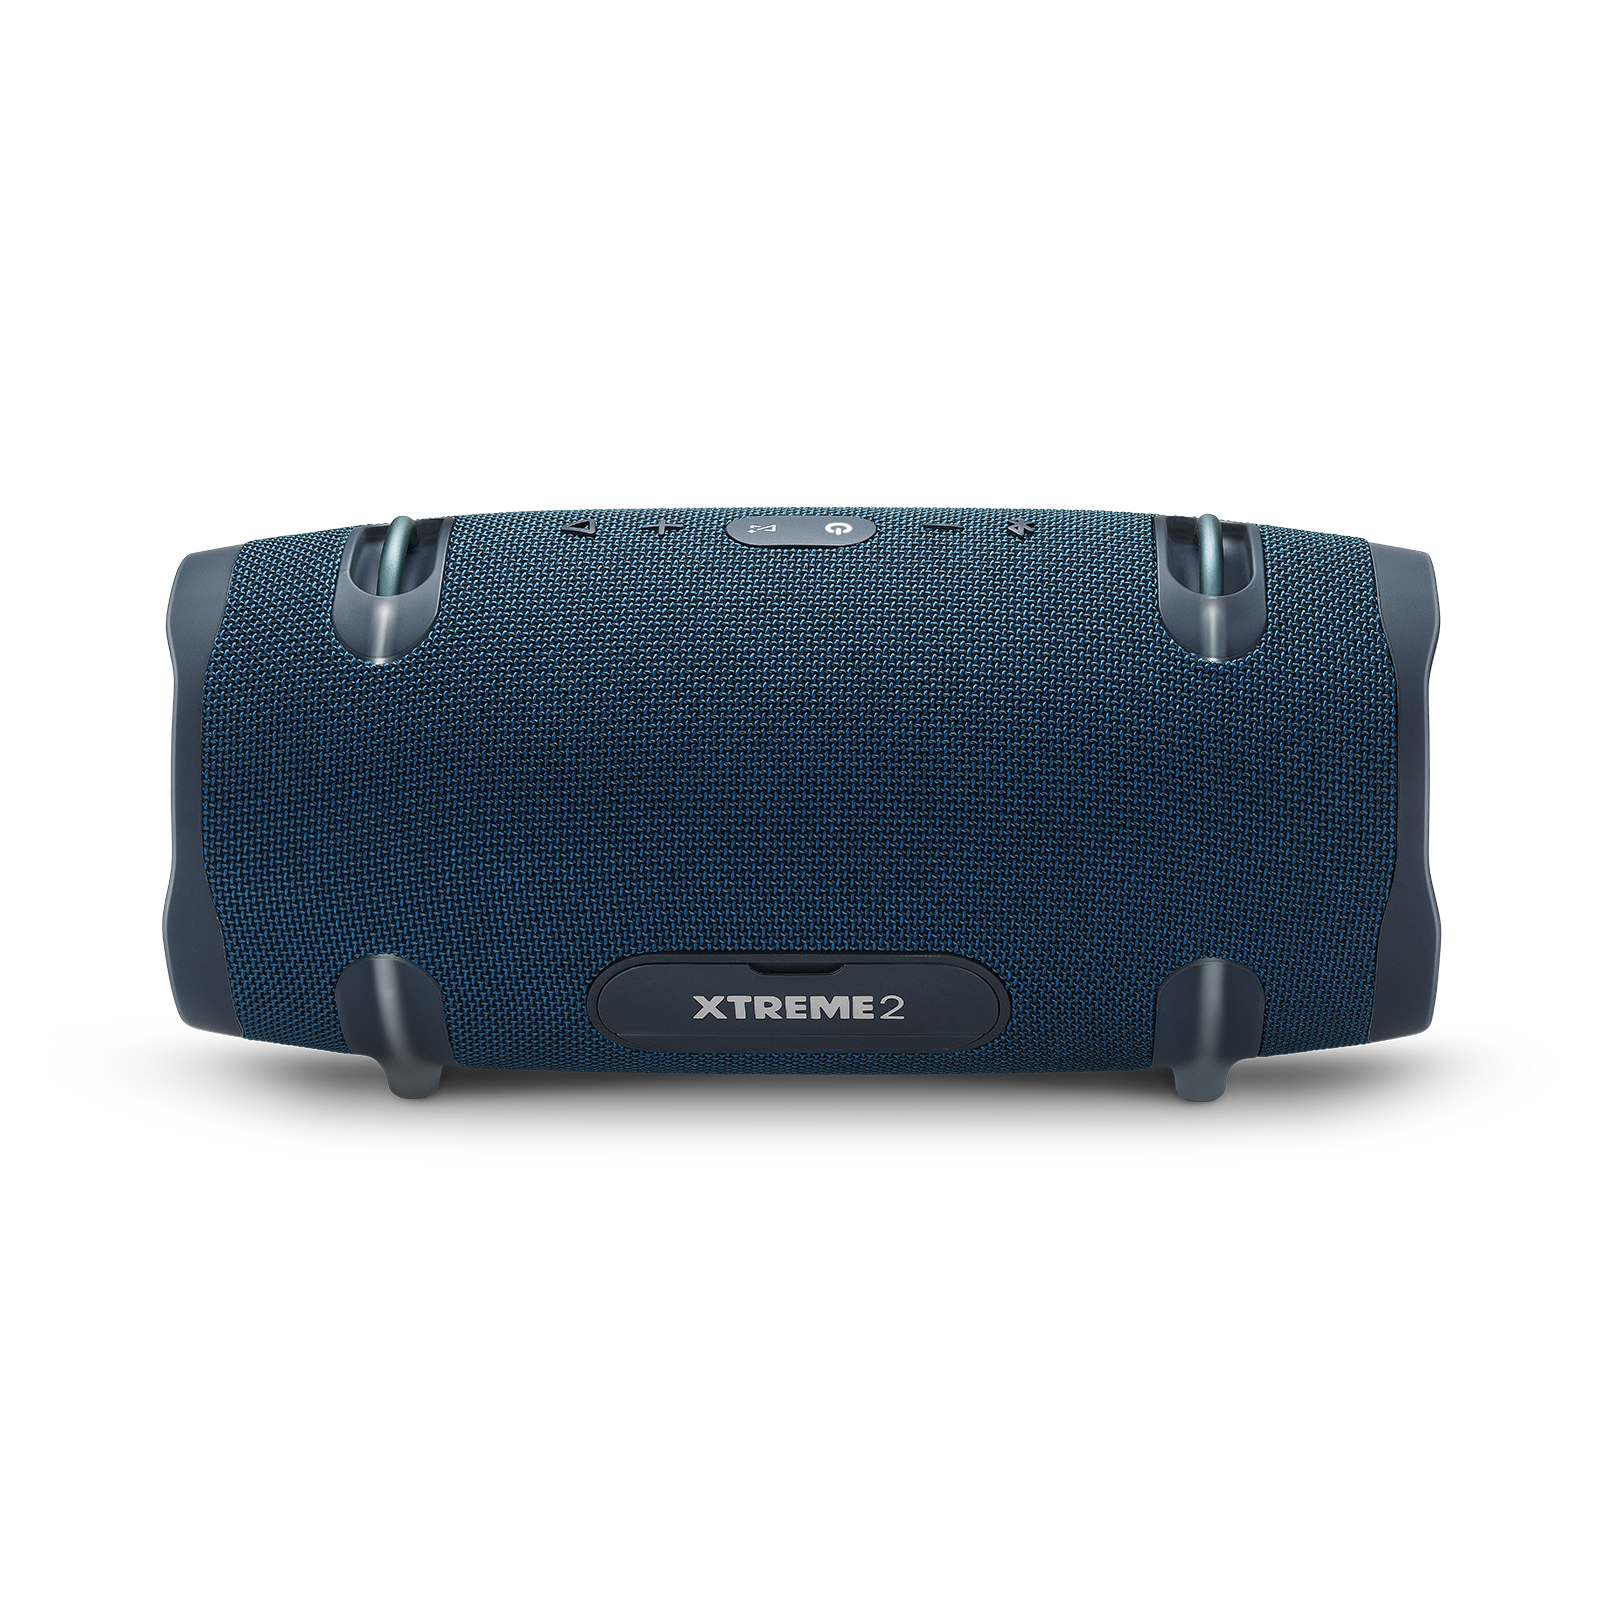 JBL Xtreme 2 - Ocean Blue - Portable Bluetooth Speaker - Back